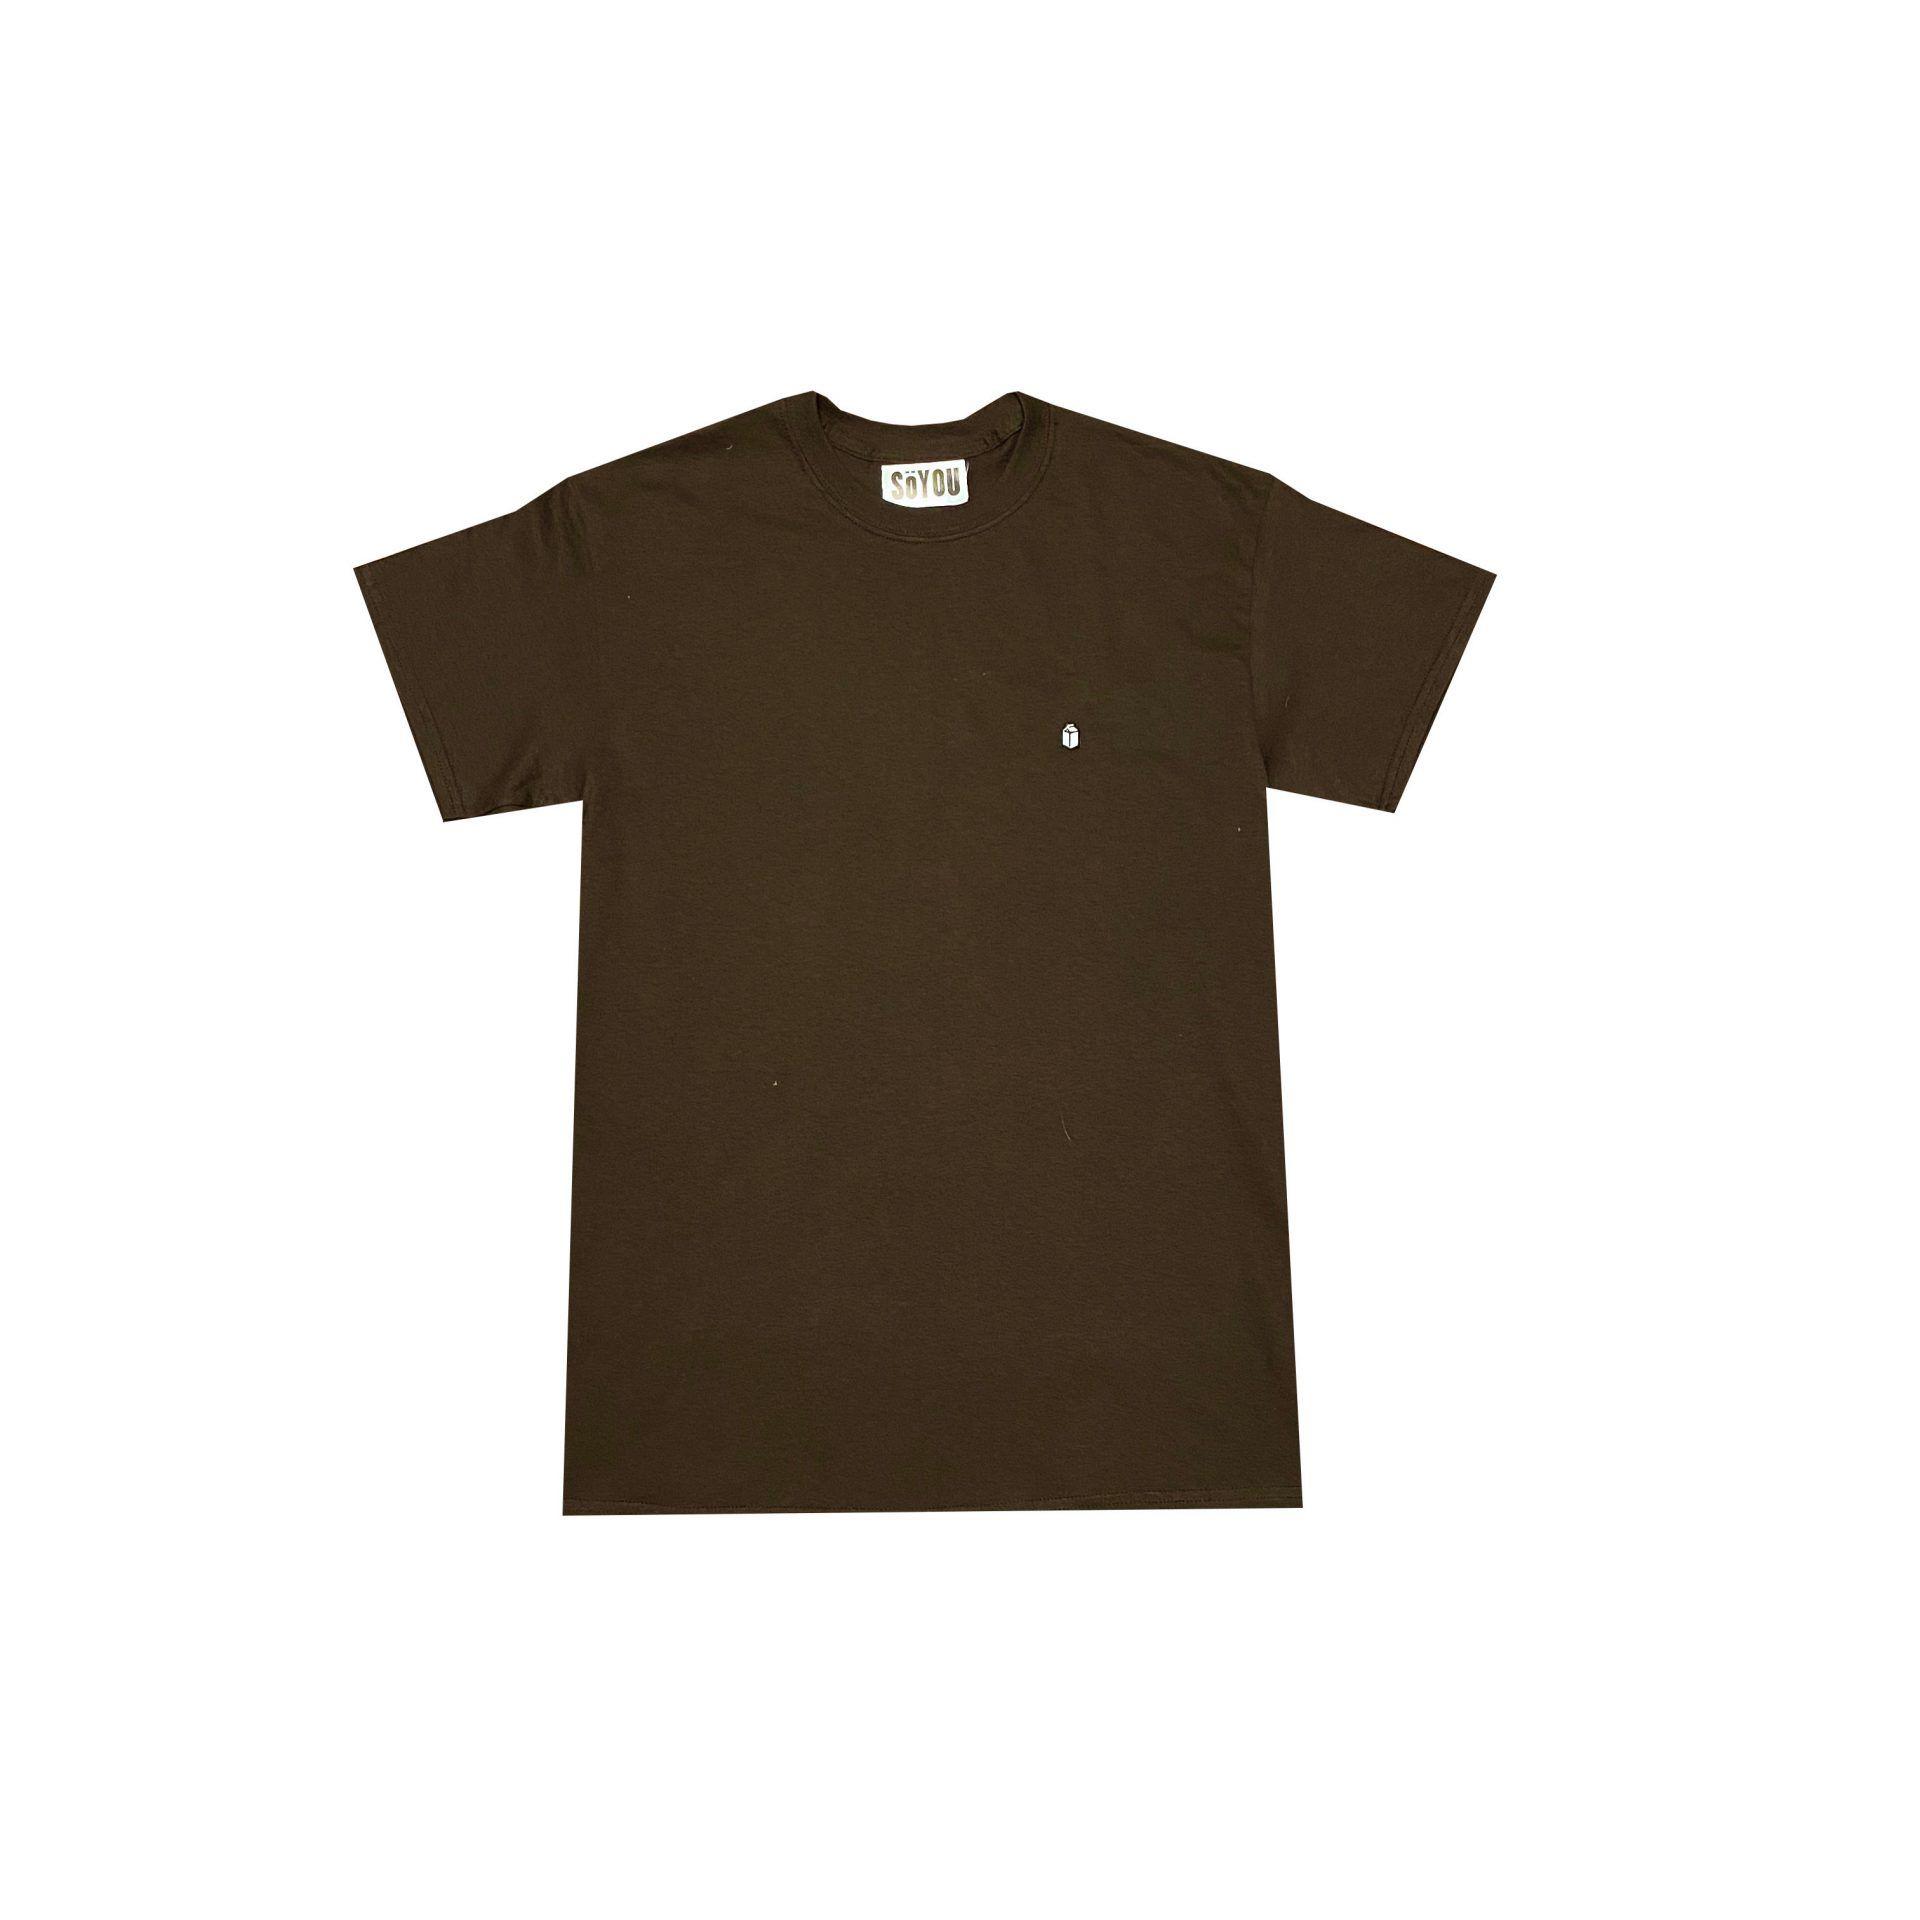 SoYou Clothing Basics T-Shirt in Dark Chocolate